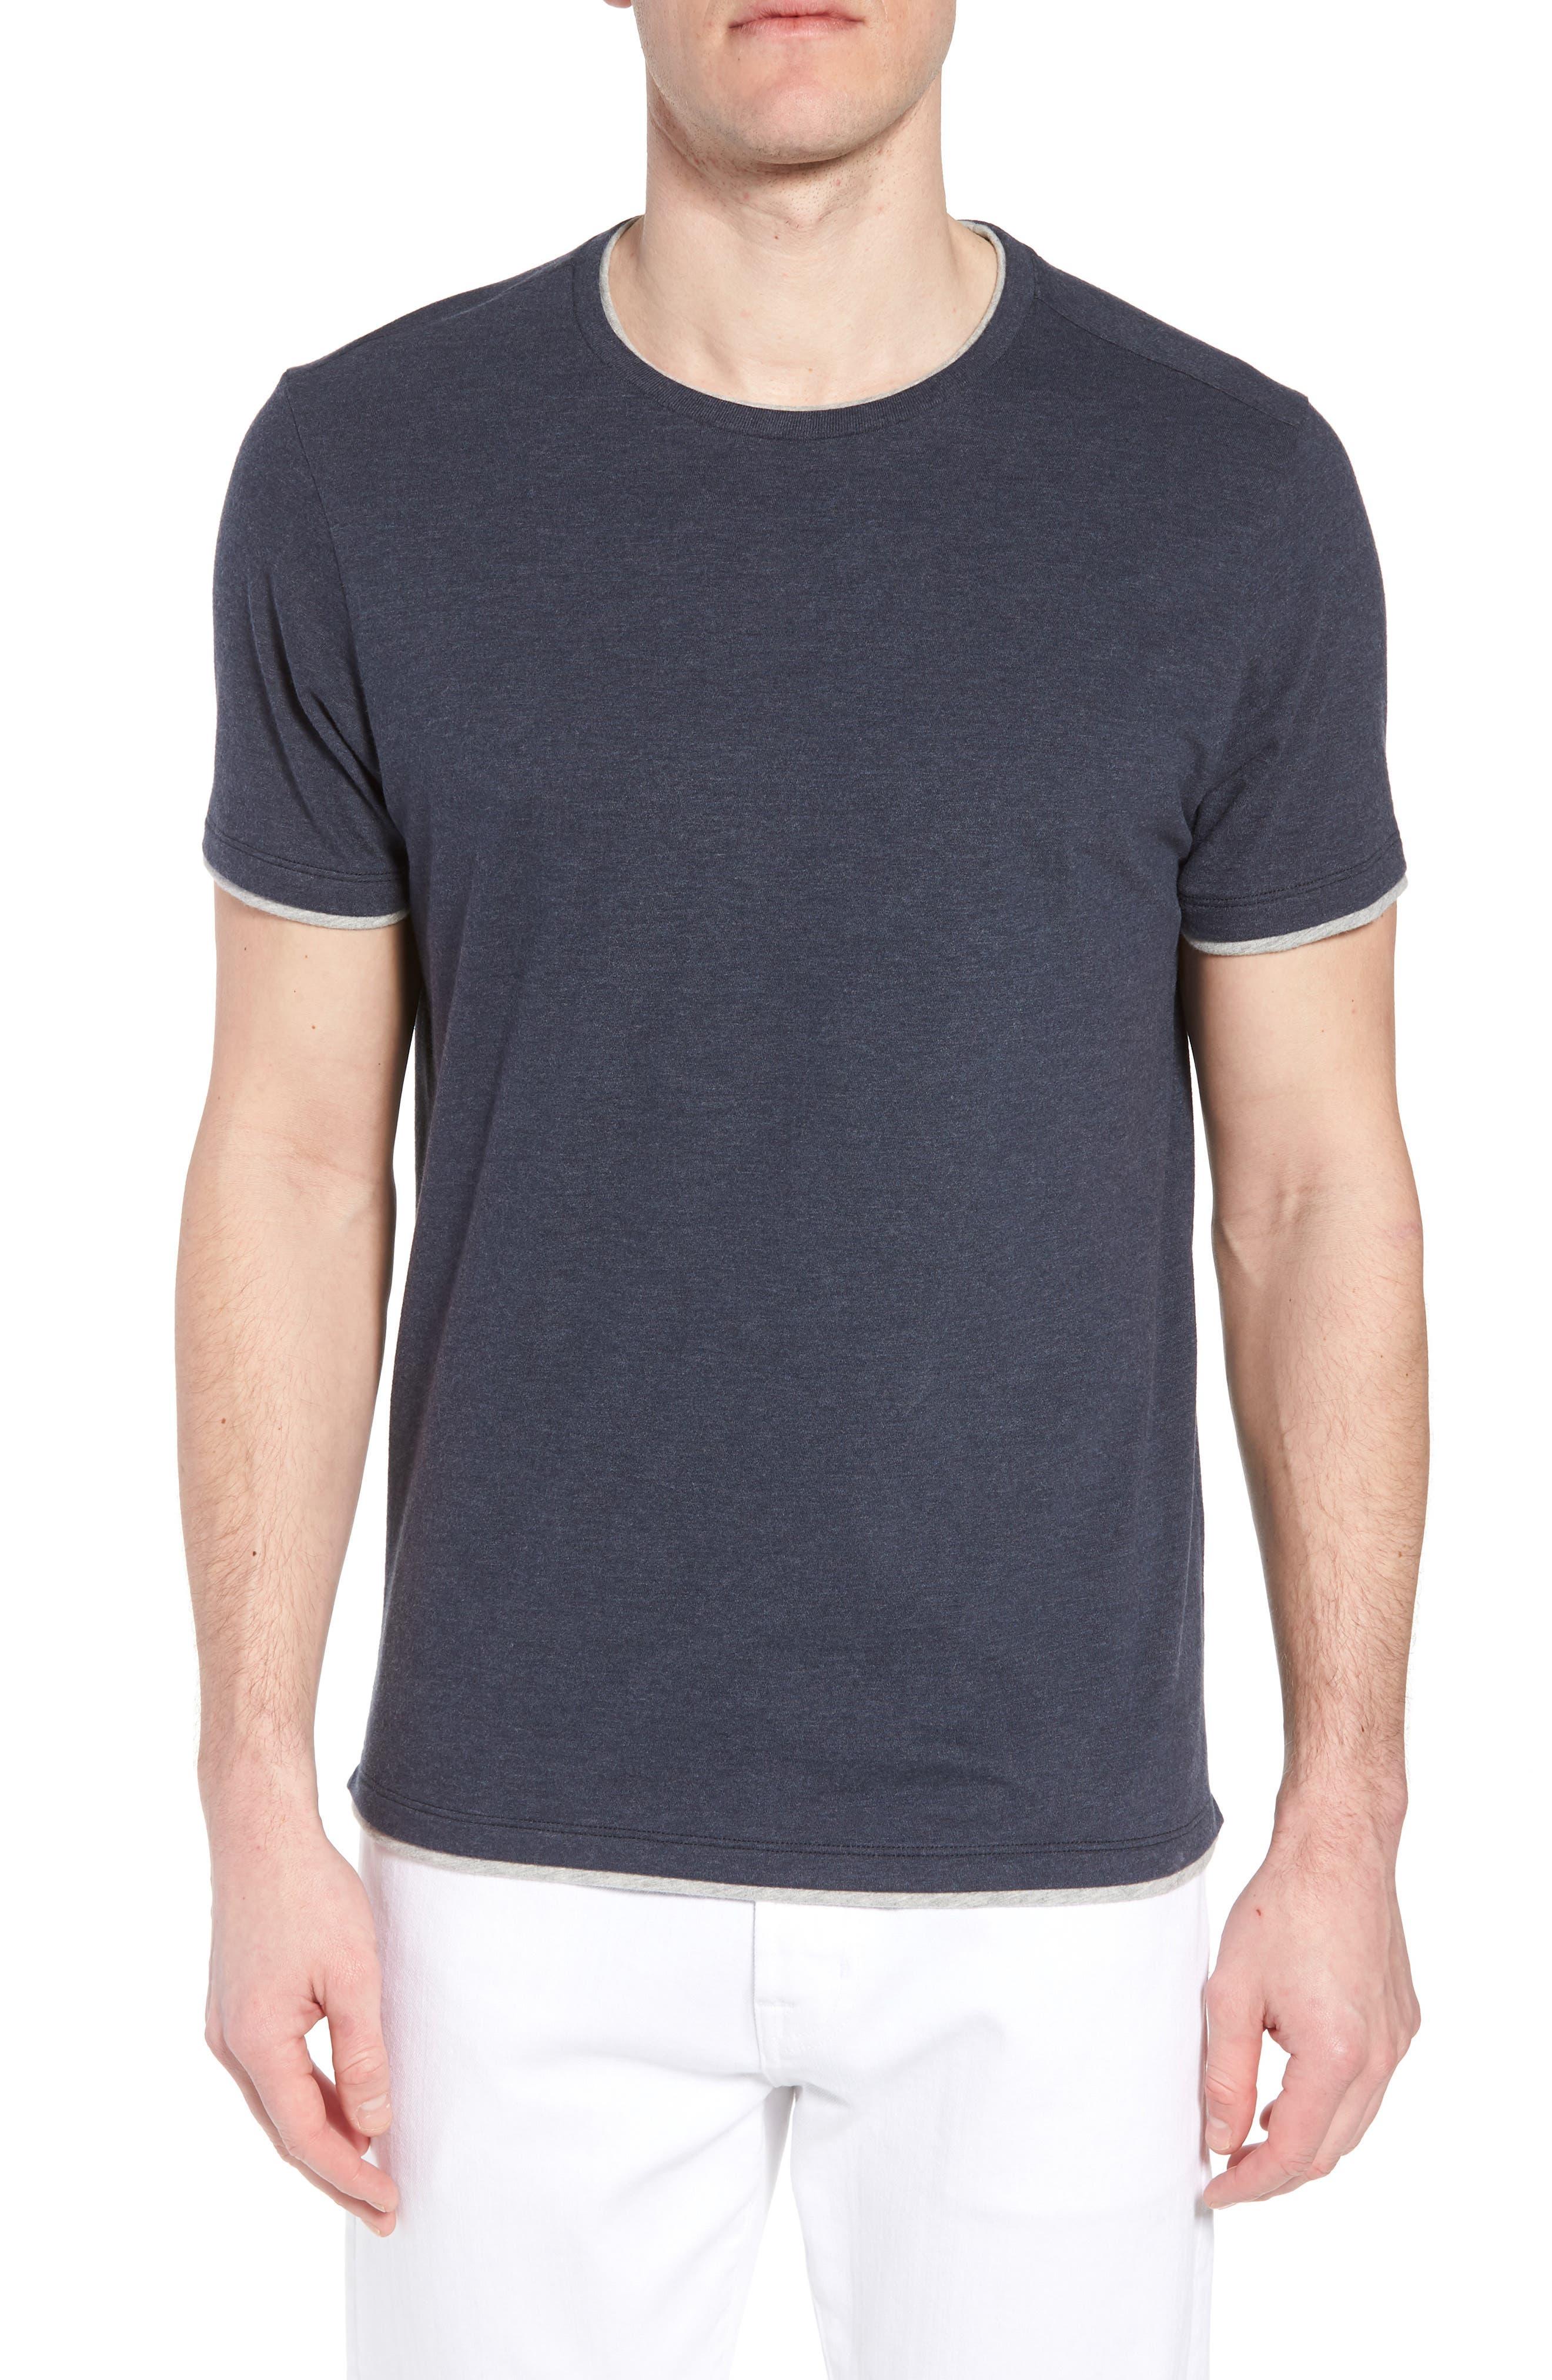 Halifax Crewneck T-Shirt,                             Main thumbnail 1, color,                             NAVY